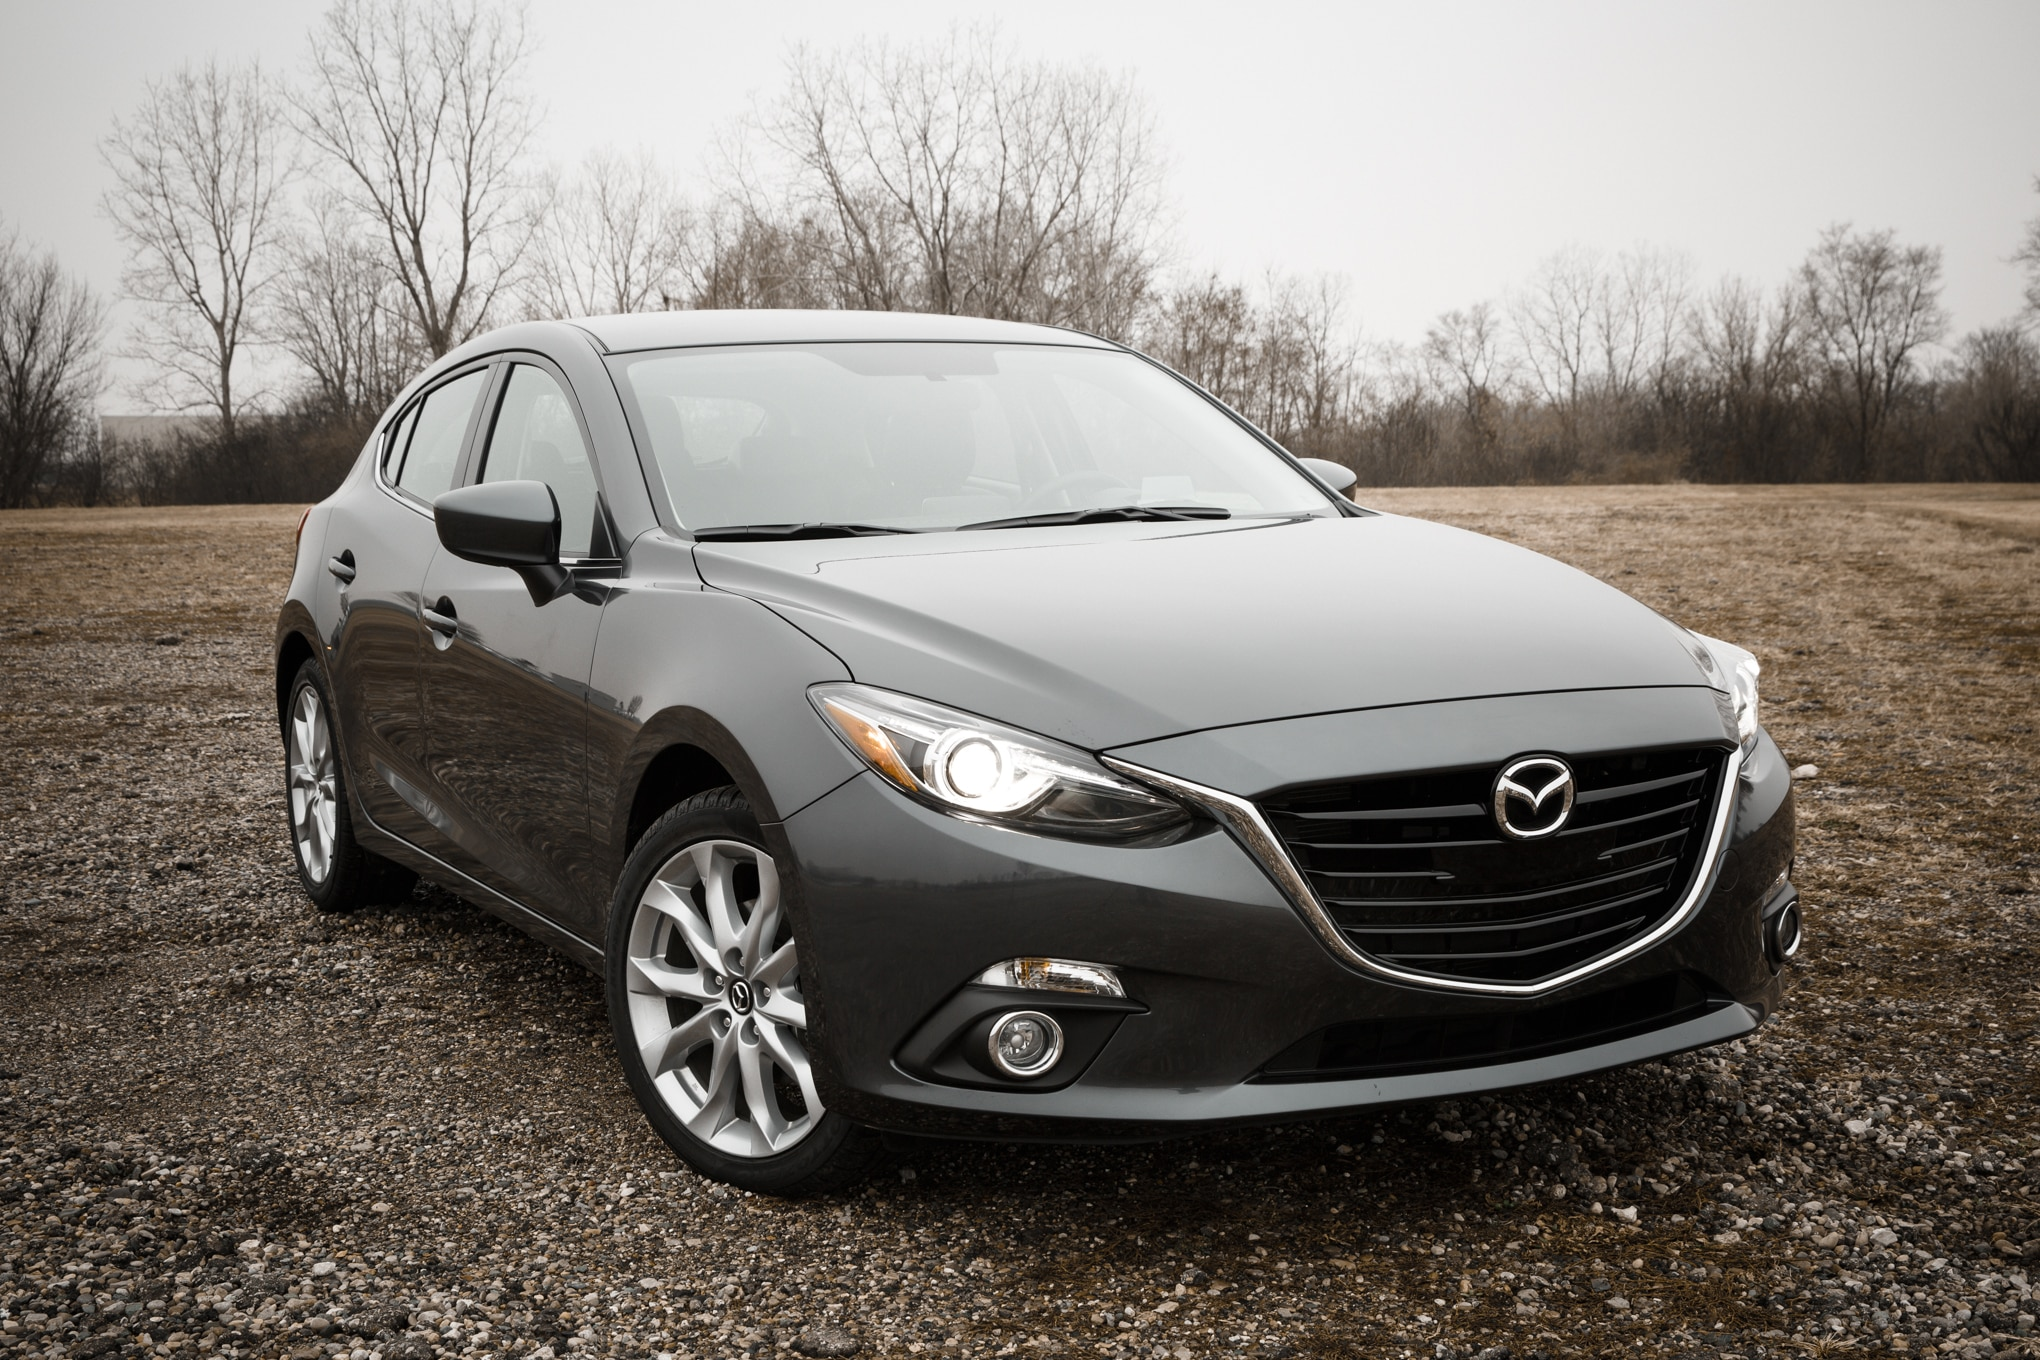 2014 Mazda 3 Four Seasons Introduction Front Three Quarter1